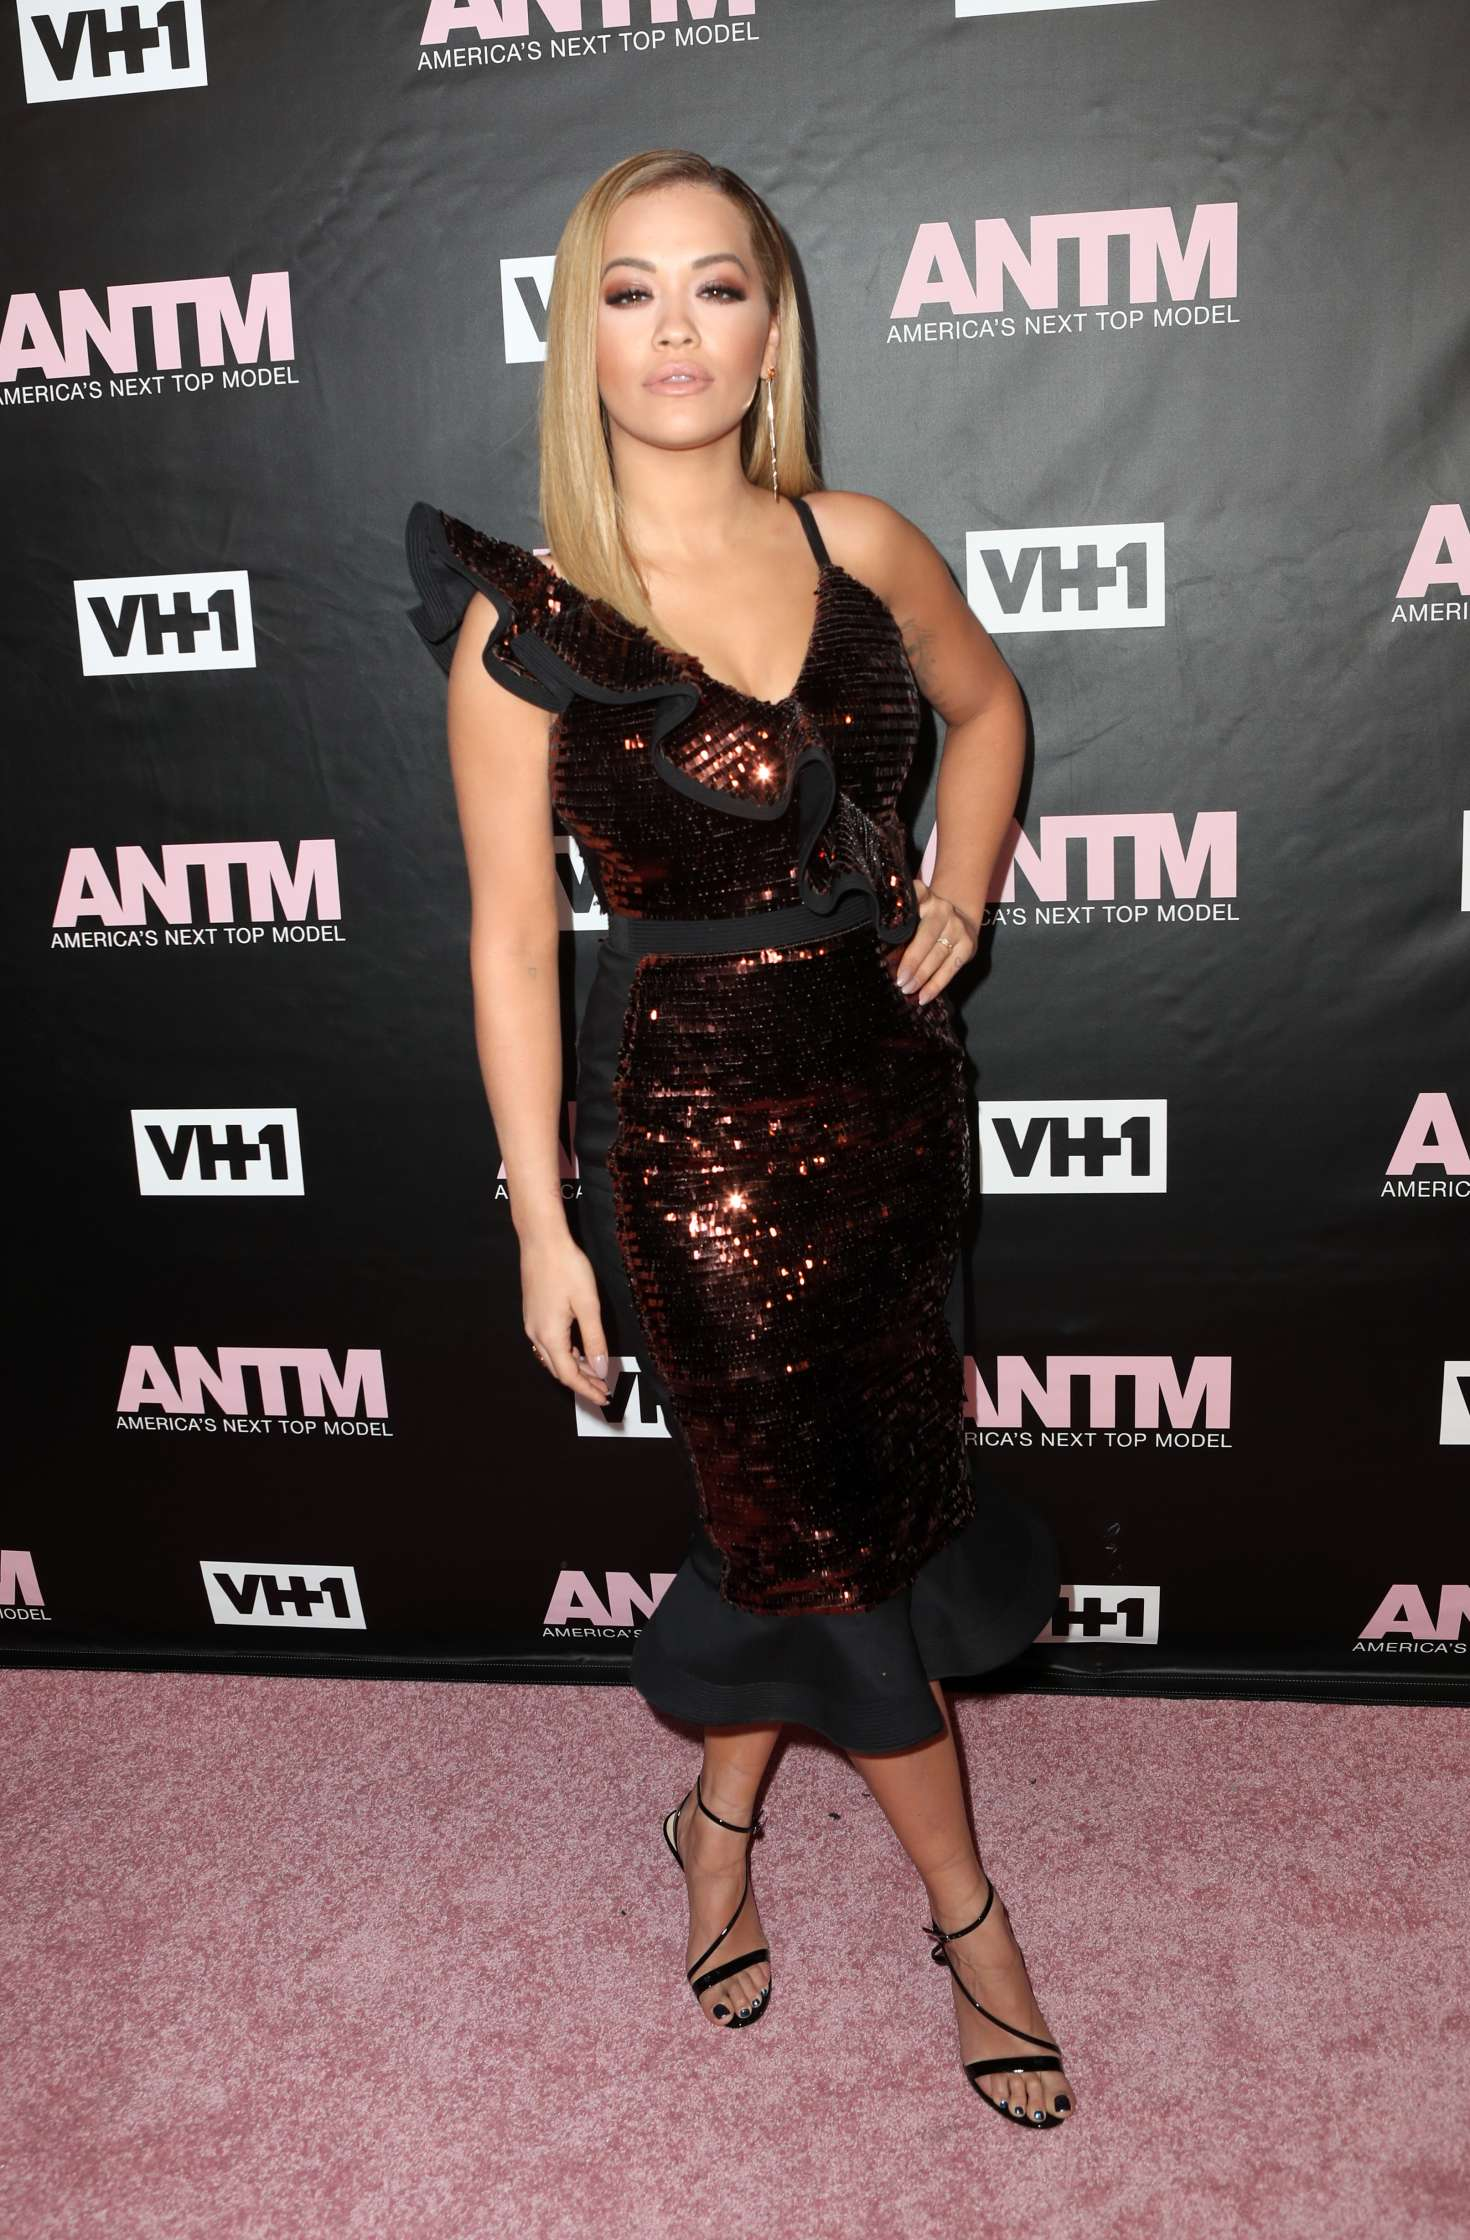 Rita Ora 2016 : Rita Ora: Americas Next Top Model Premiere Party -46